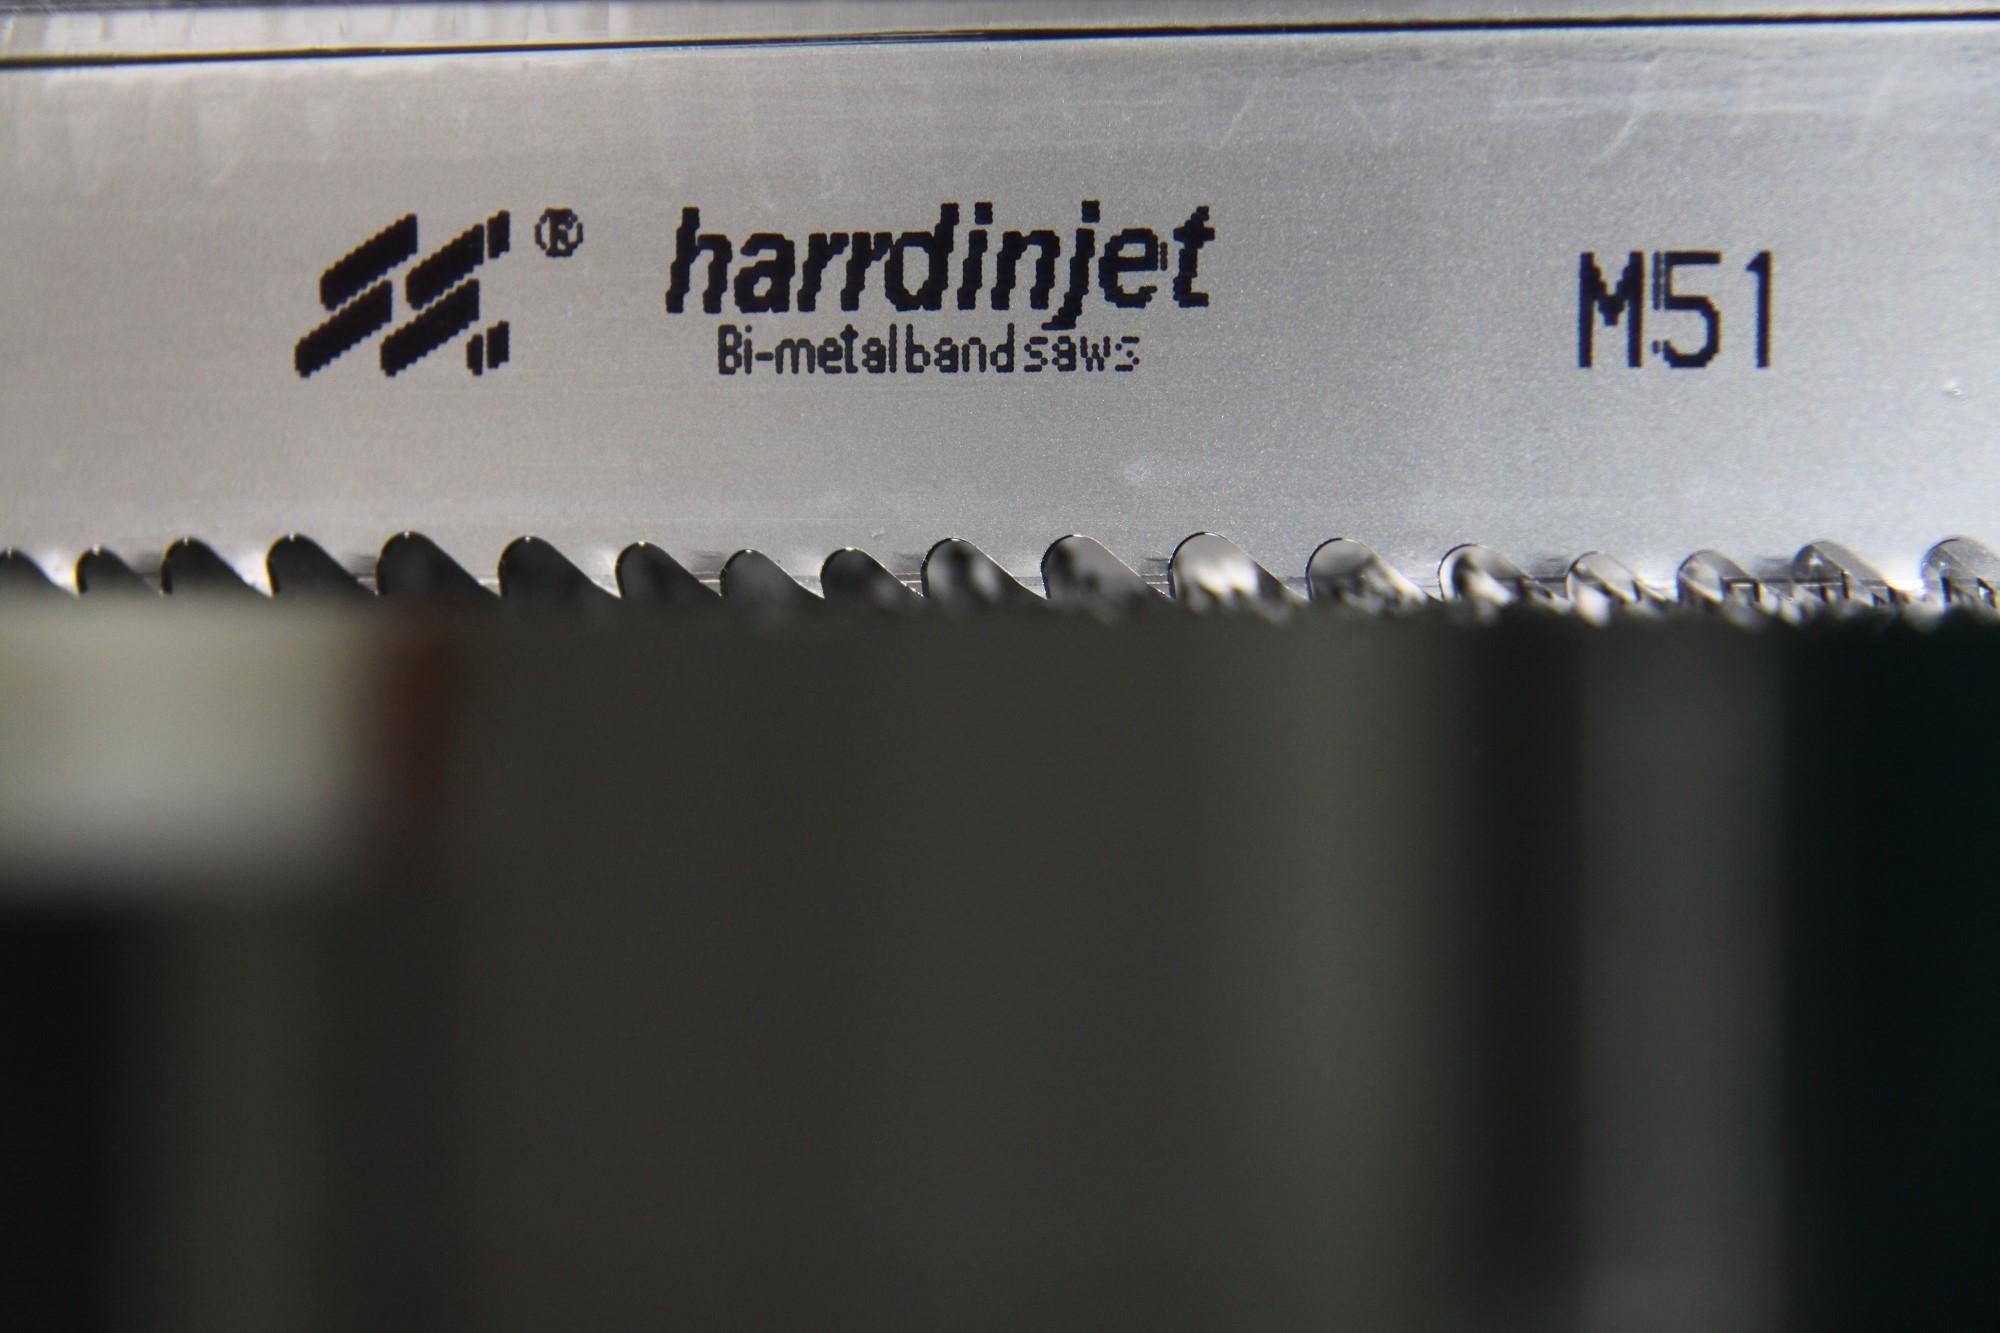 Harrdinjet Bimetal Band Saw Blade